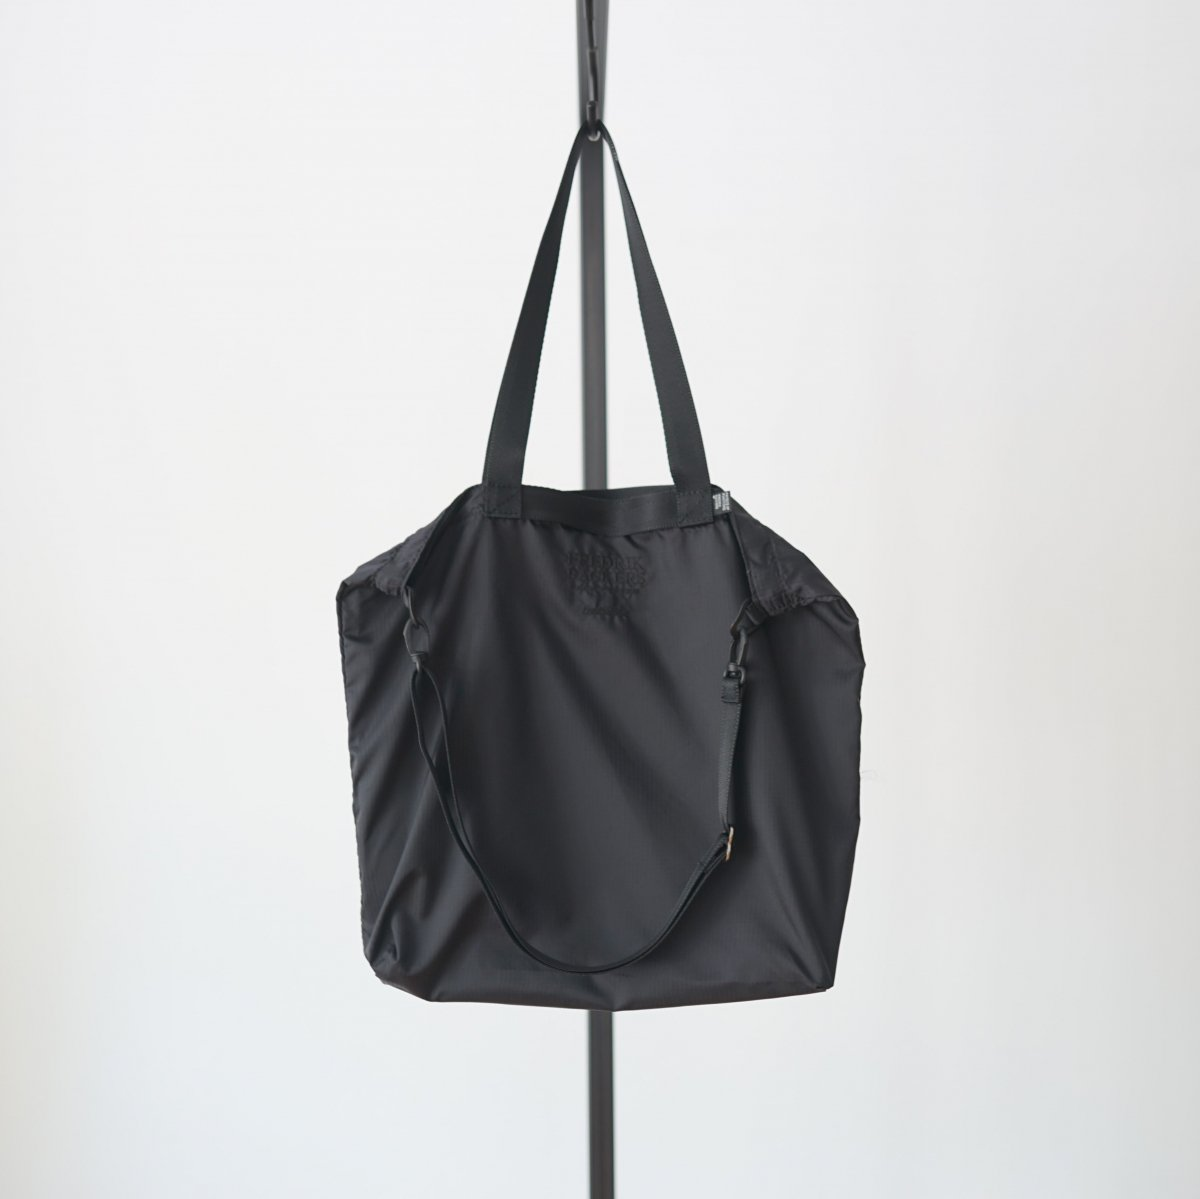 【FreshService フレッシュサービス】 FreshService × FREDRIK PACKERS PACKABLE VAIL SALL - BLACK